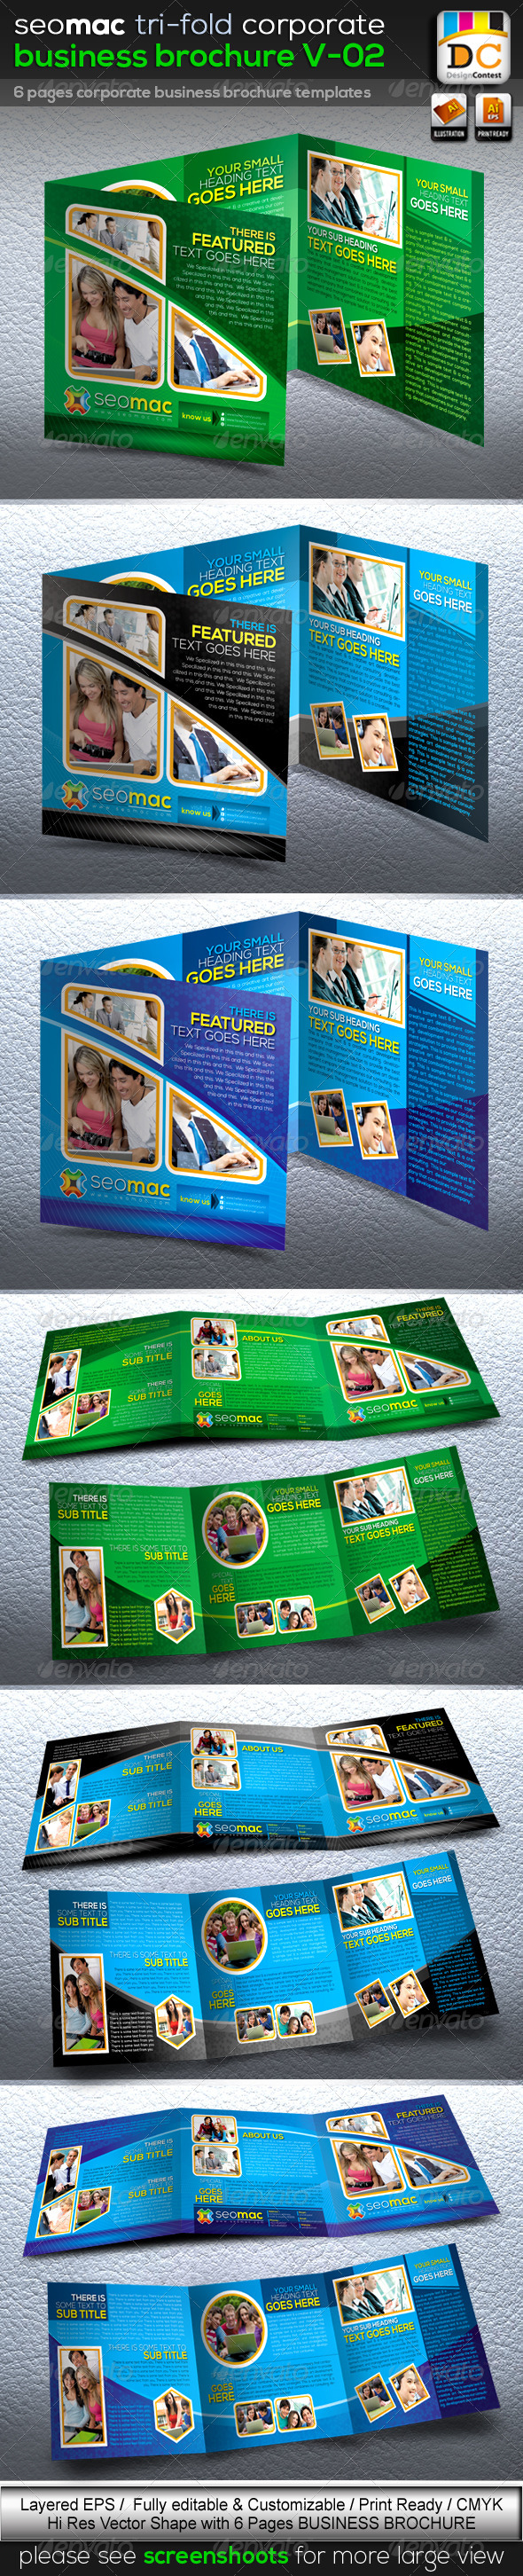 SeoMac Tri-fold Corporate Business Brochure V-02 - Corporate Brochures